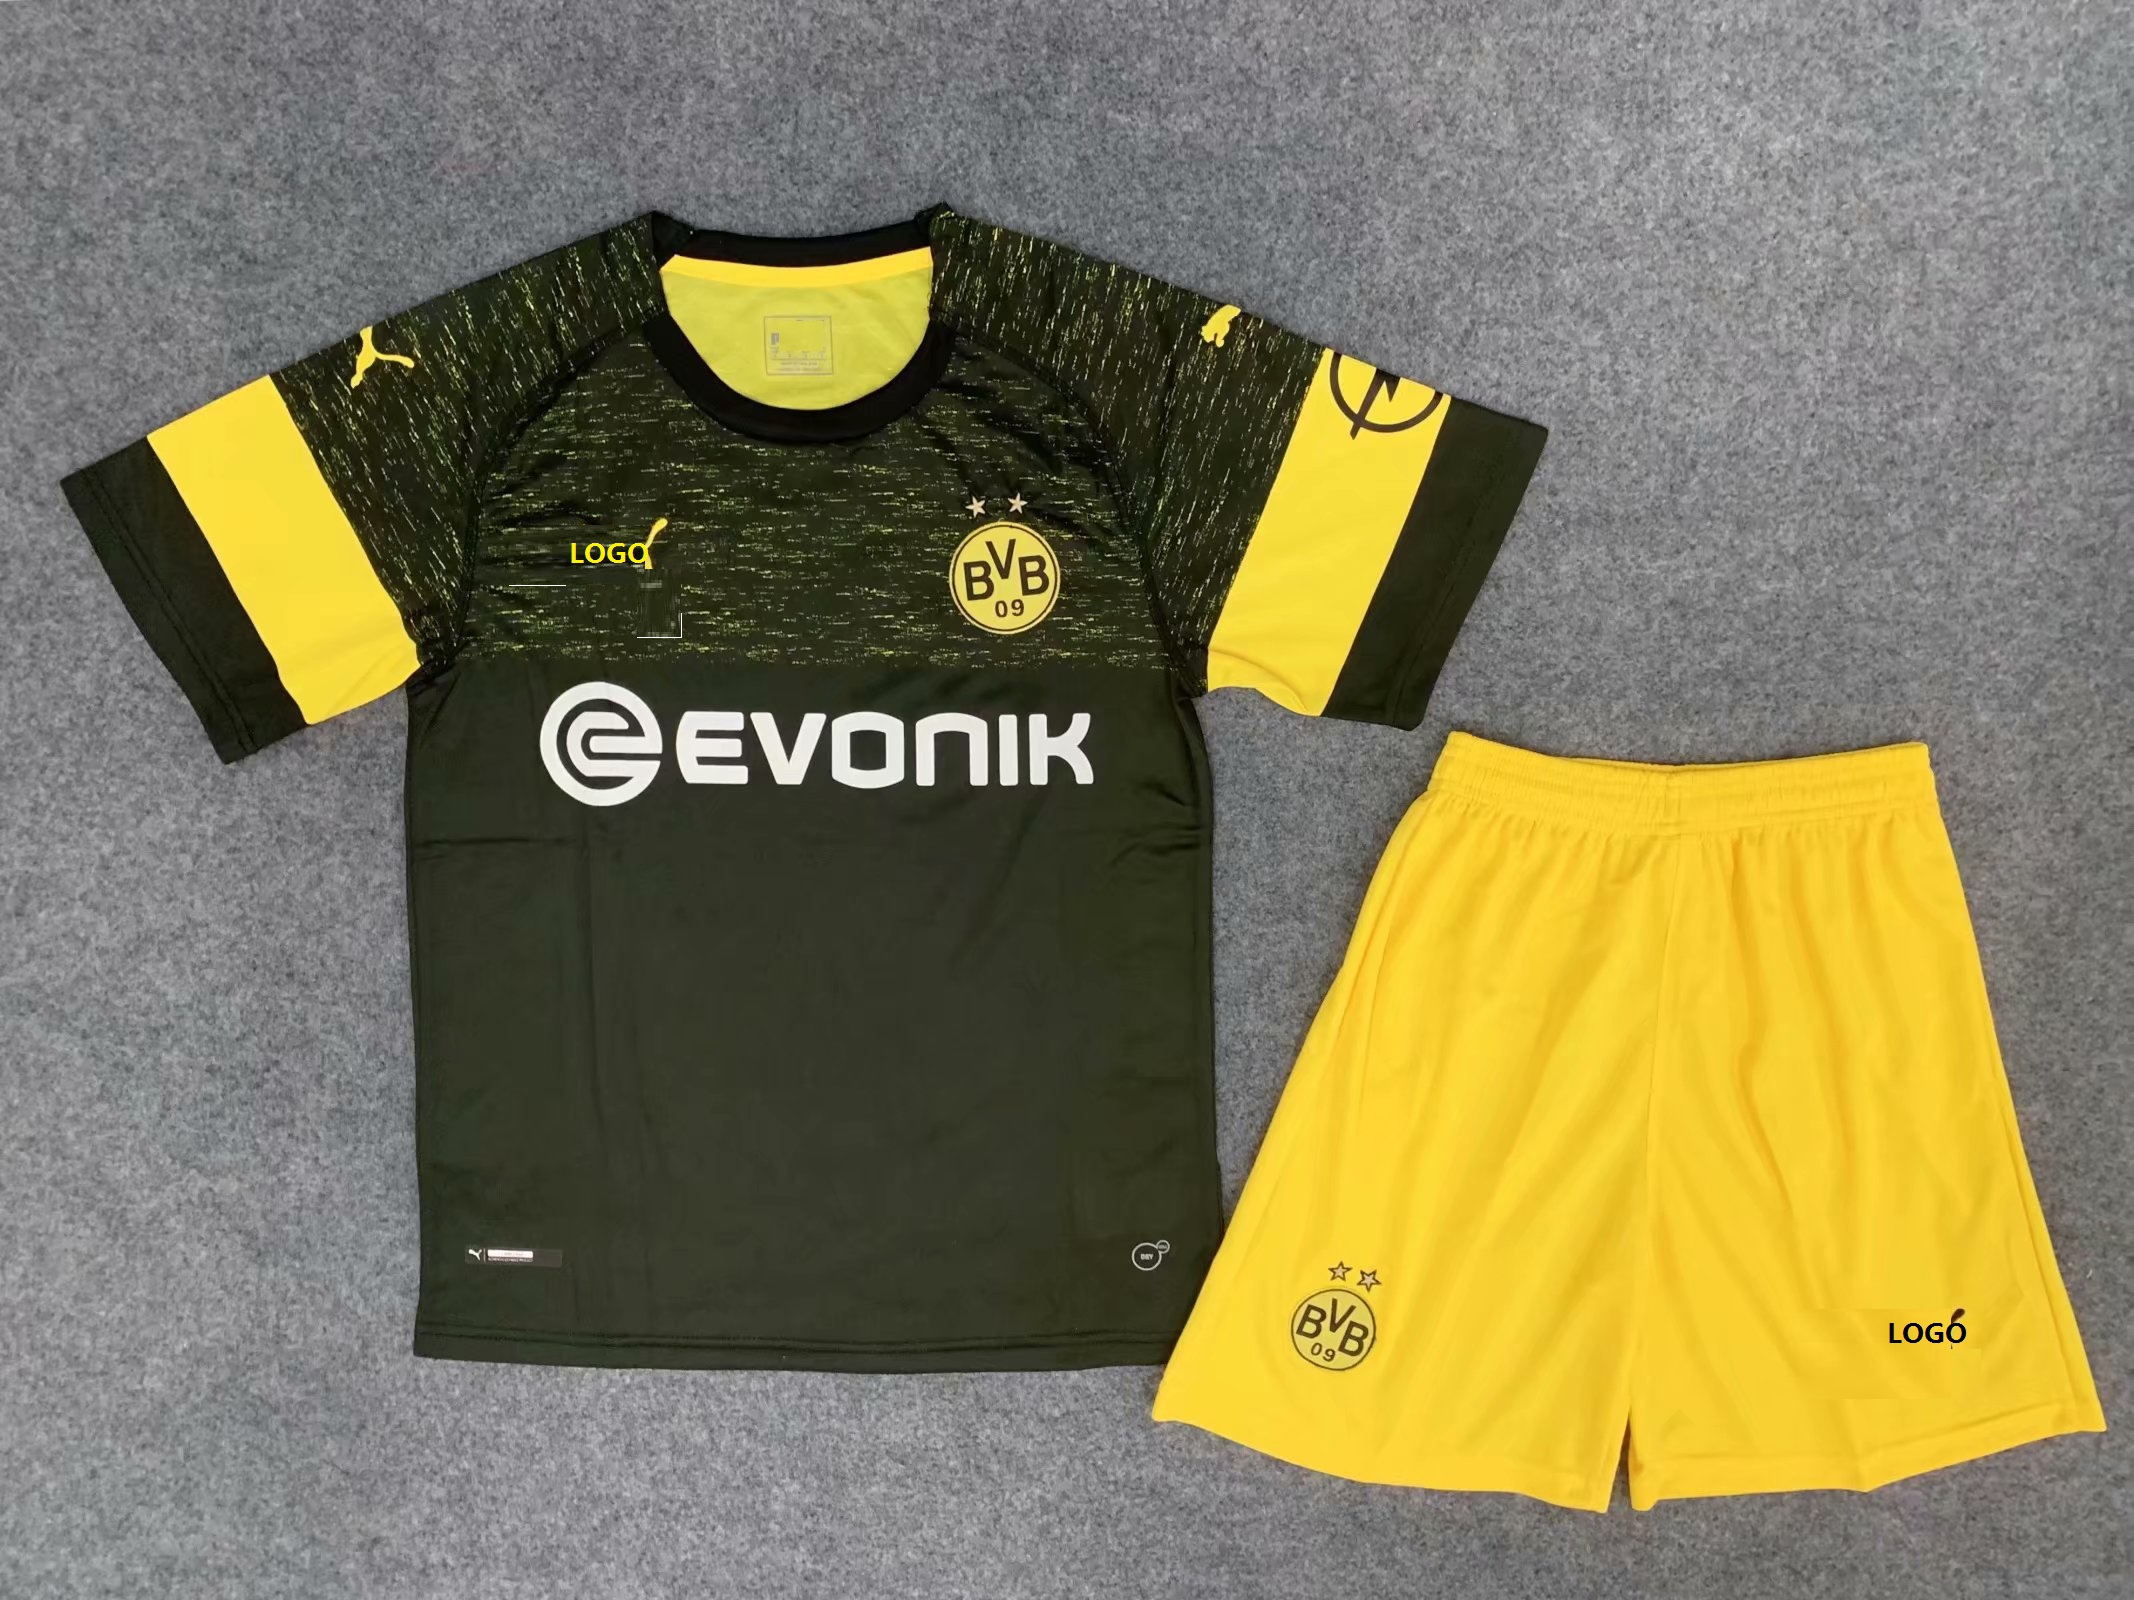 huge discount 2d6fd 32c57 2018/19 Adult Borussia Dortmund Football Uniforms Men Black Away Soccer  Jerseys Kits